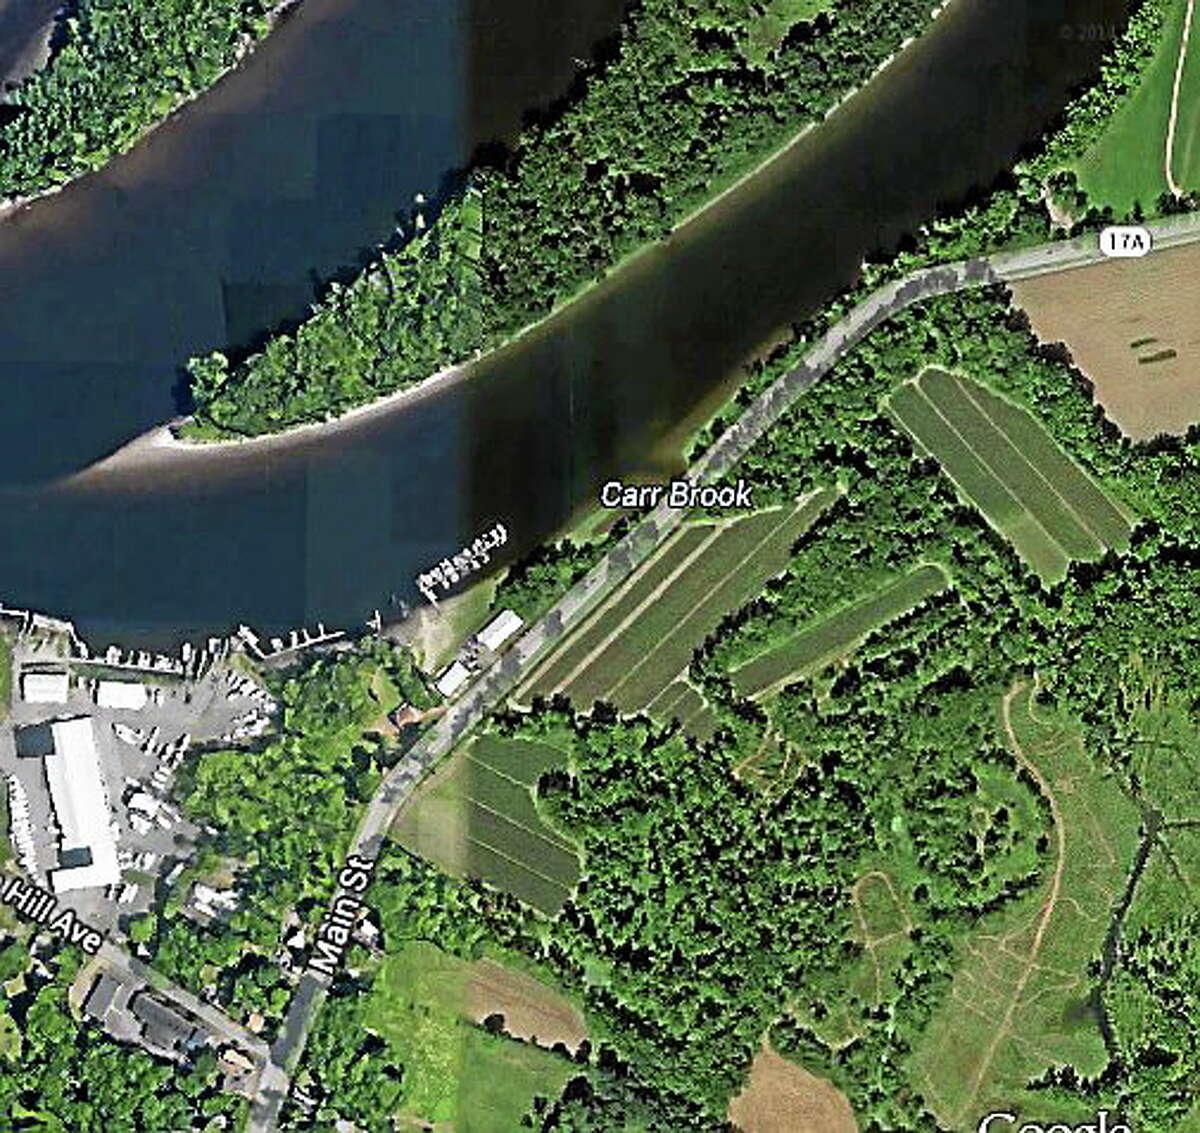 Google Earth Bridge repair work will begin over Carr Brook off 17A (Main Street) in Portland in May.